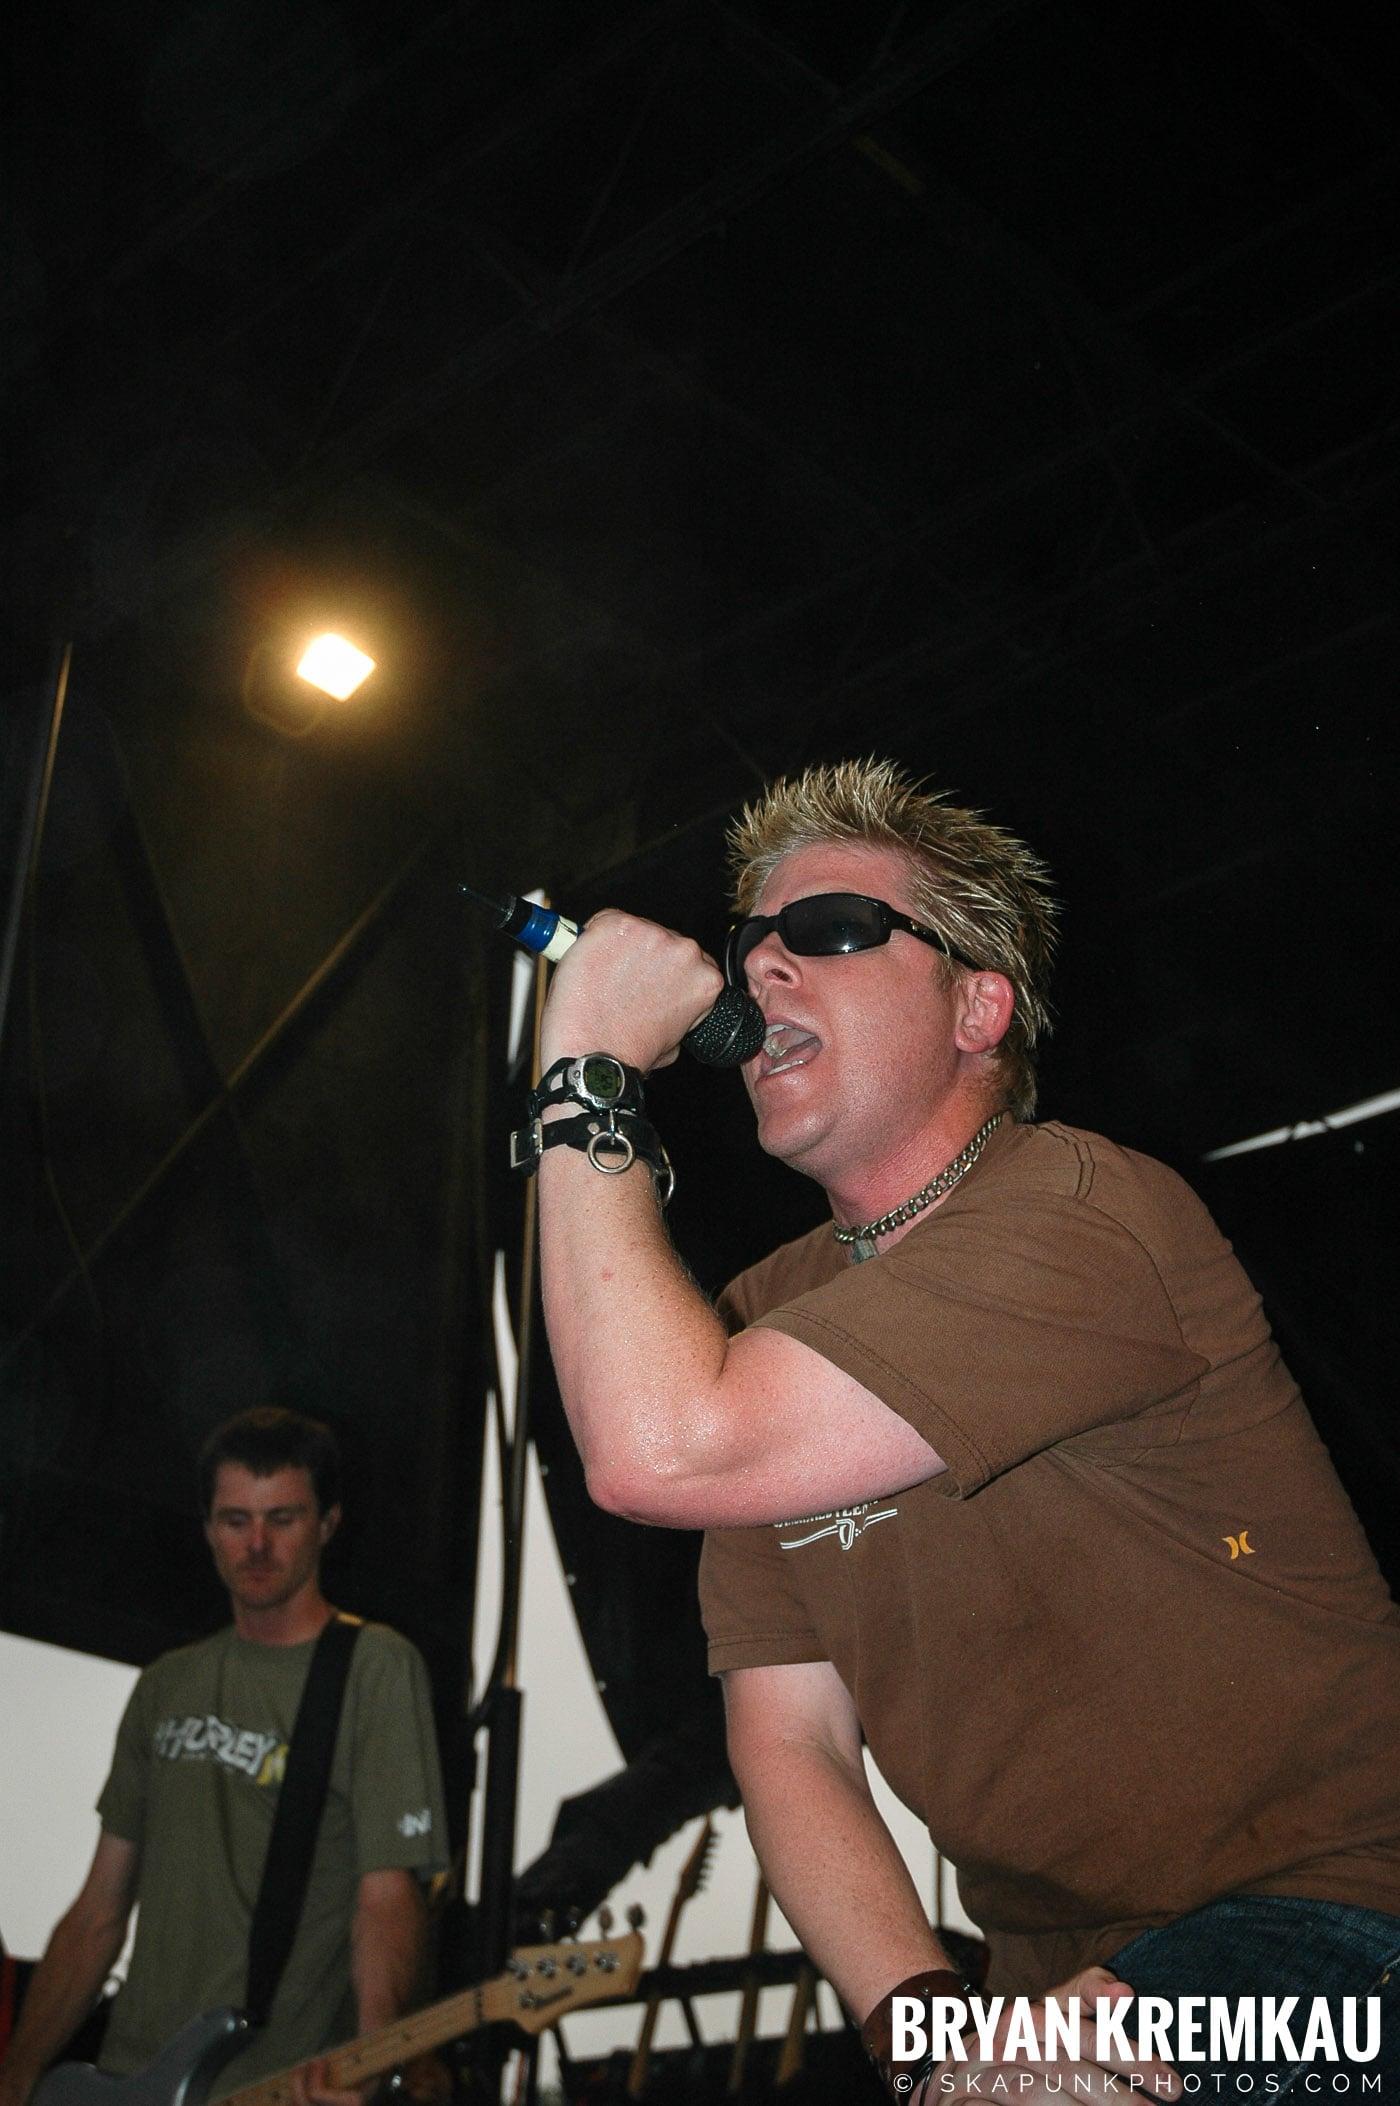 The Offspring @ Warped Tour 05, NYC - 8.12.05 (14)